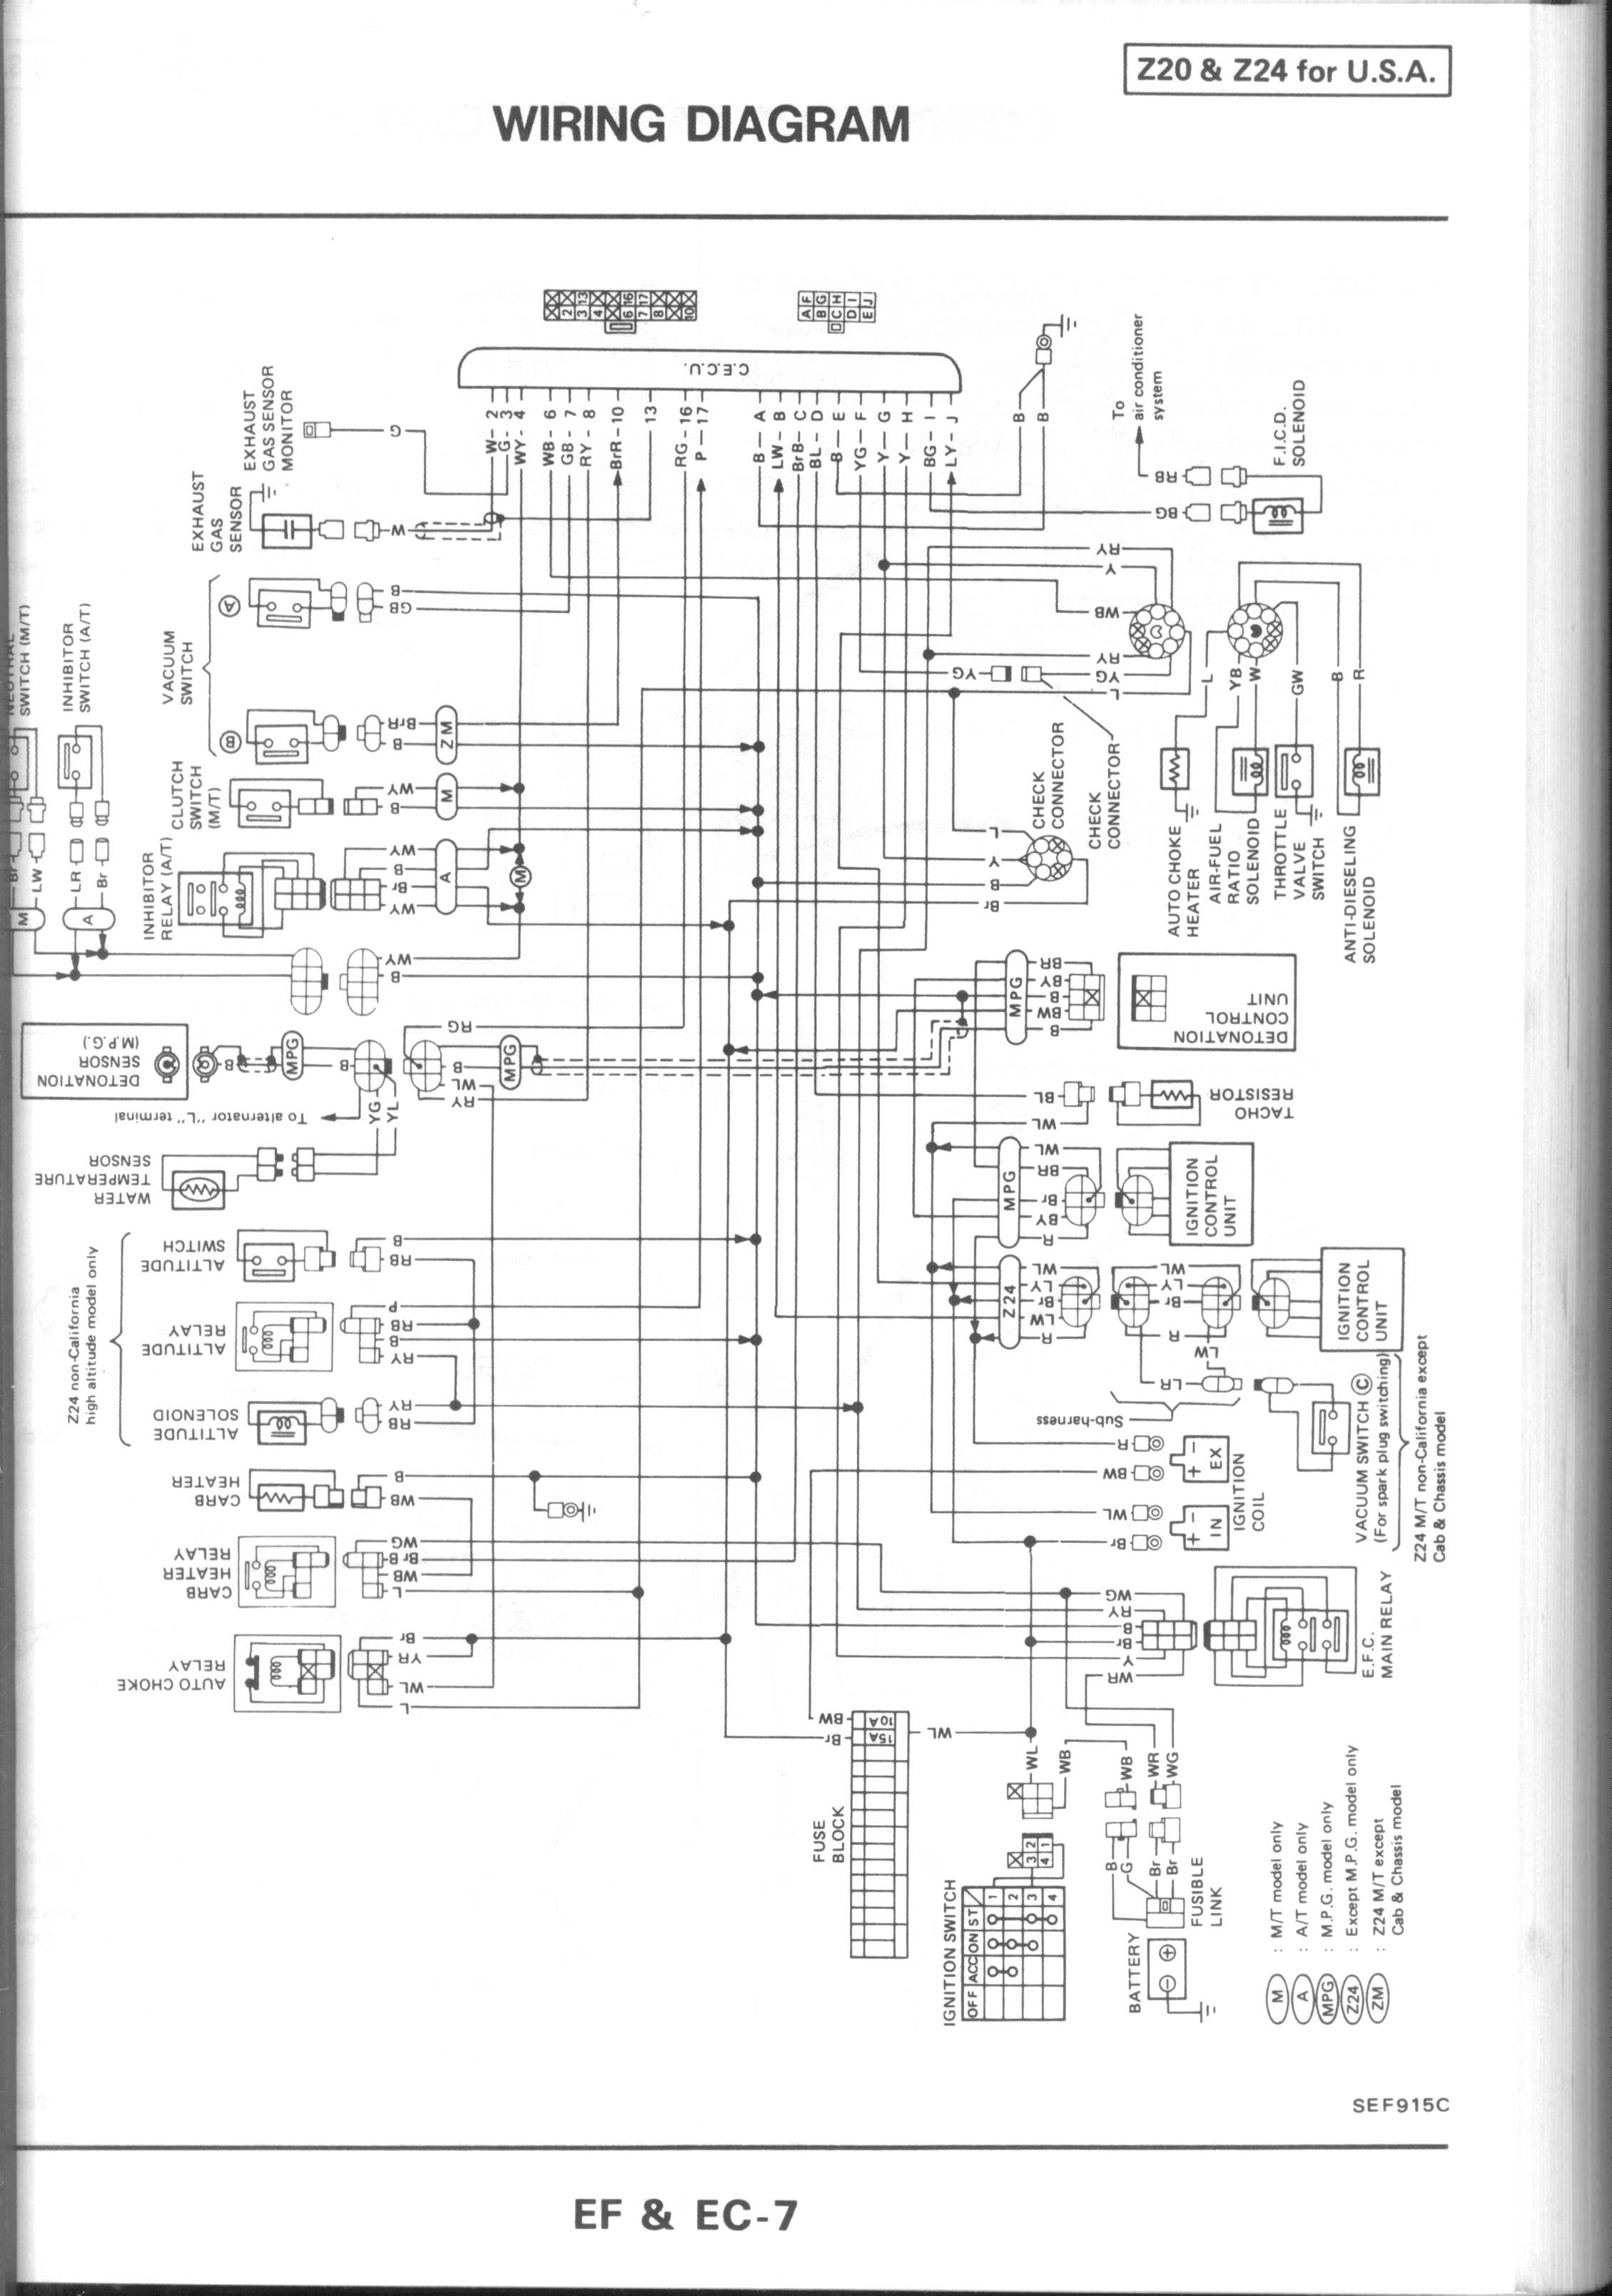 720_z24_ecu_wiring?quality\\\=80\\\&strip\\\=all wiring diagram yamaha golf cart g19et yamaha g1 golf cart repair  at fashall.co